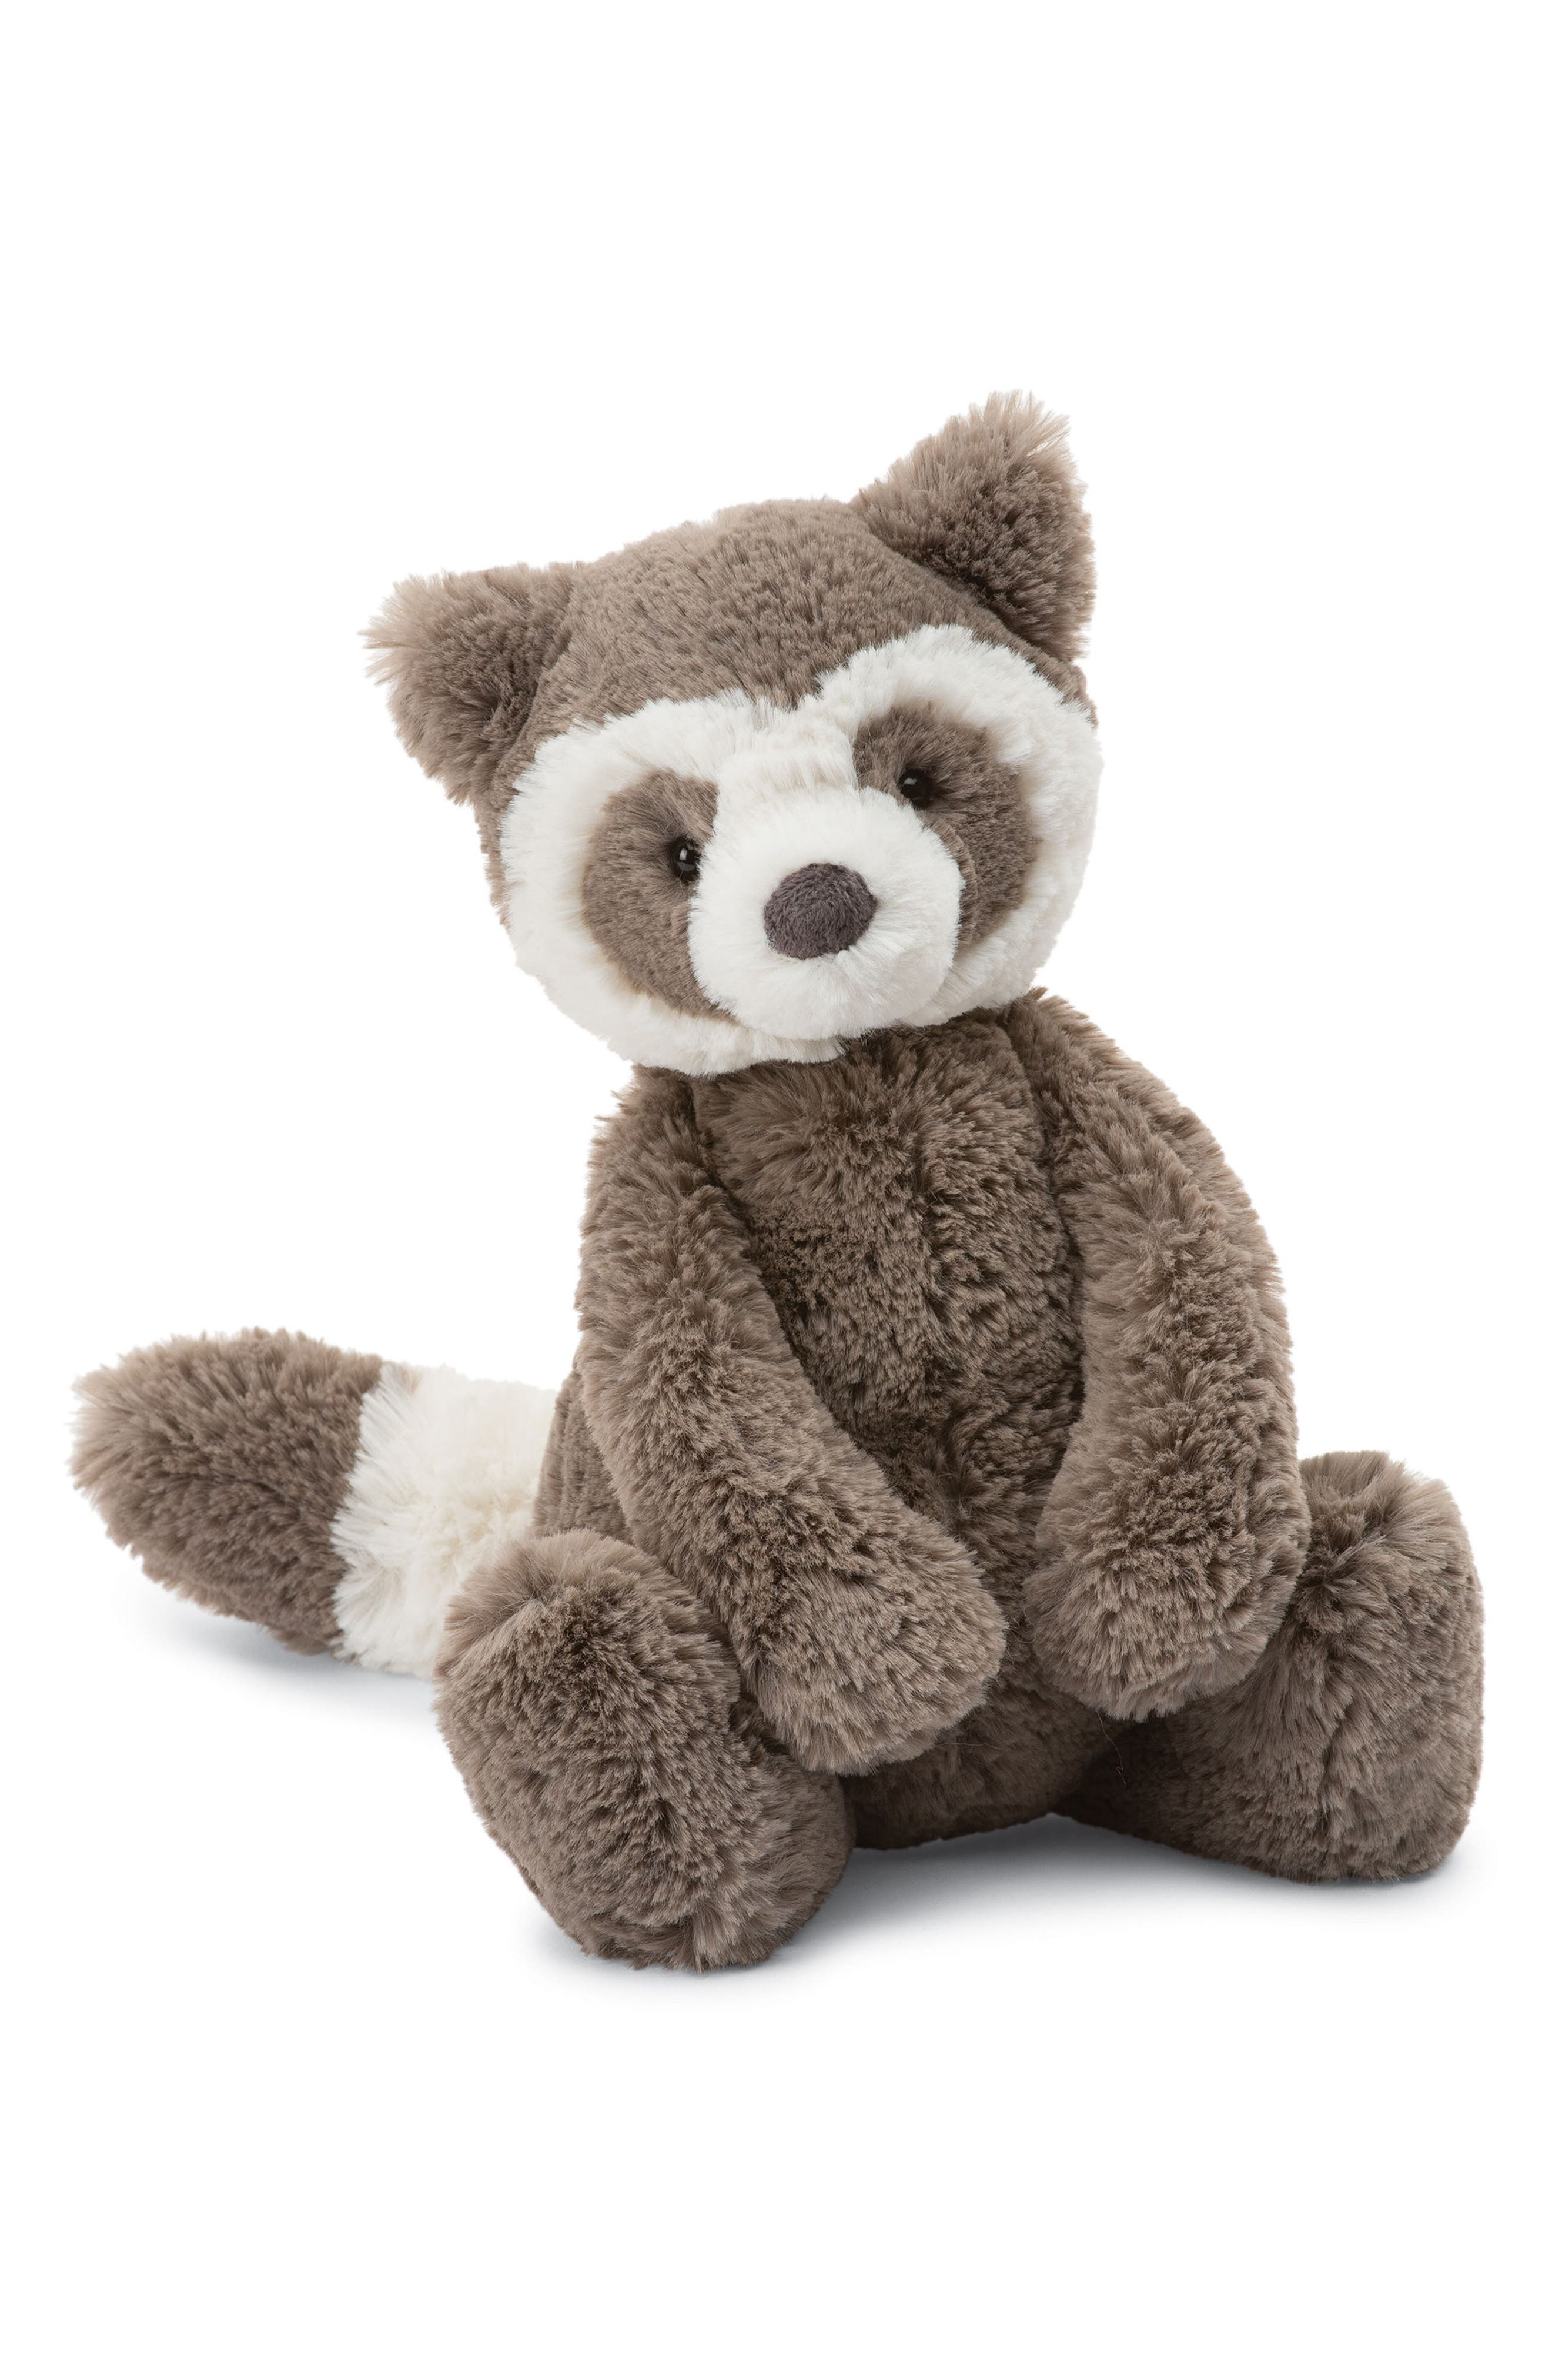 Bashful Raccoon Stuffed Animal,                             Main thumbnail 1, color,                             BROWN/ CREAM